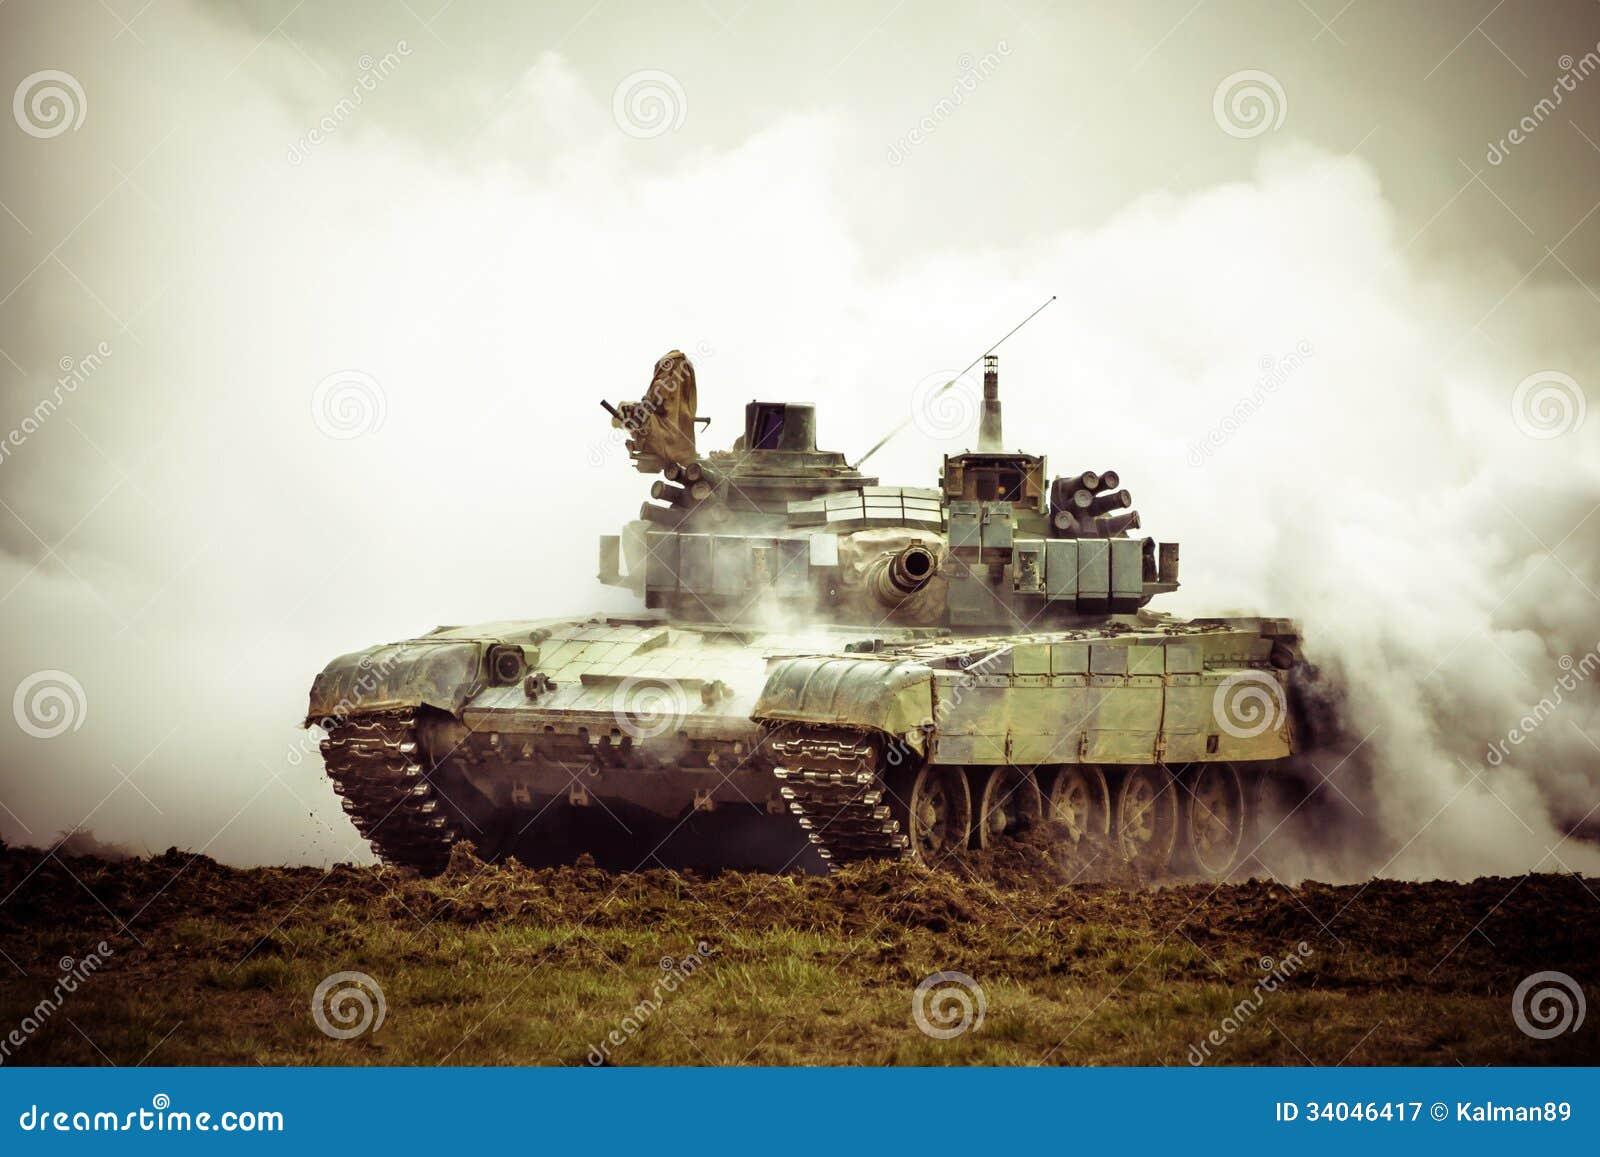 Military tank on war